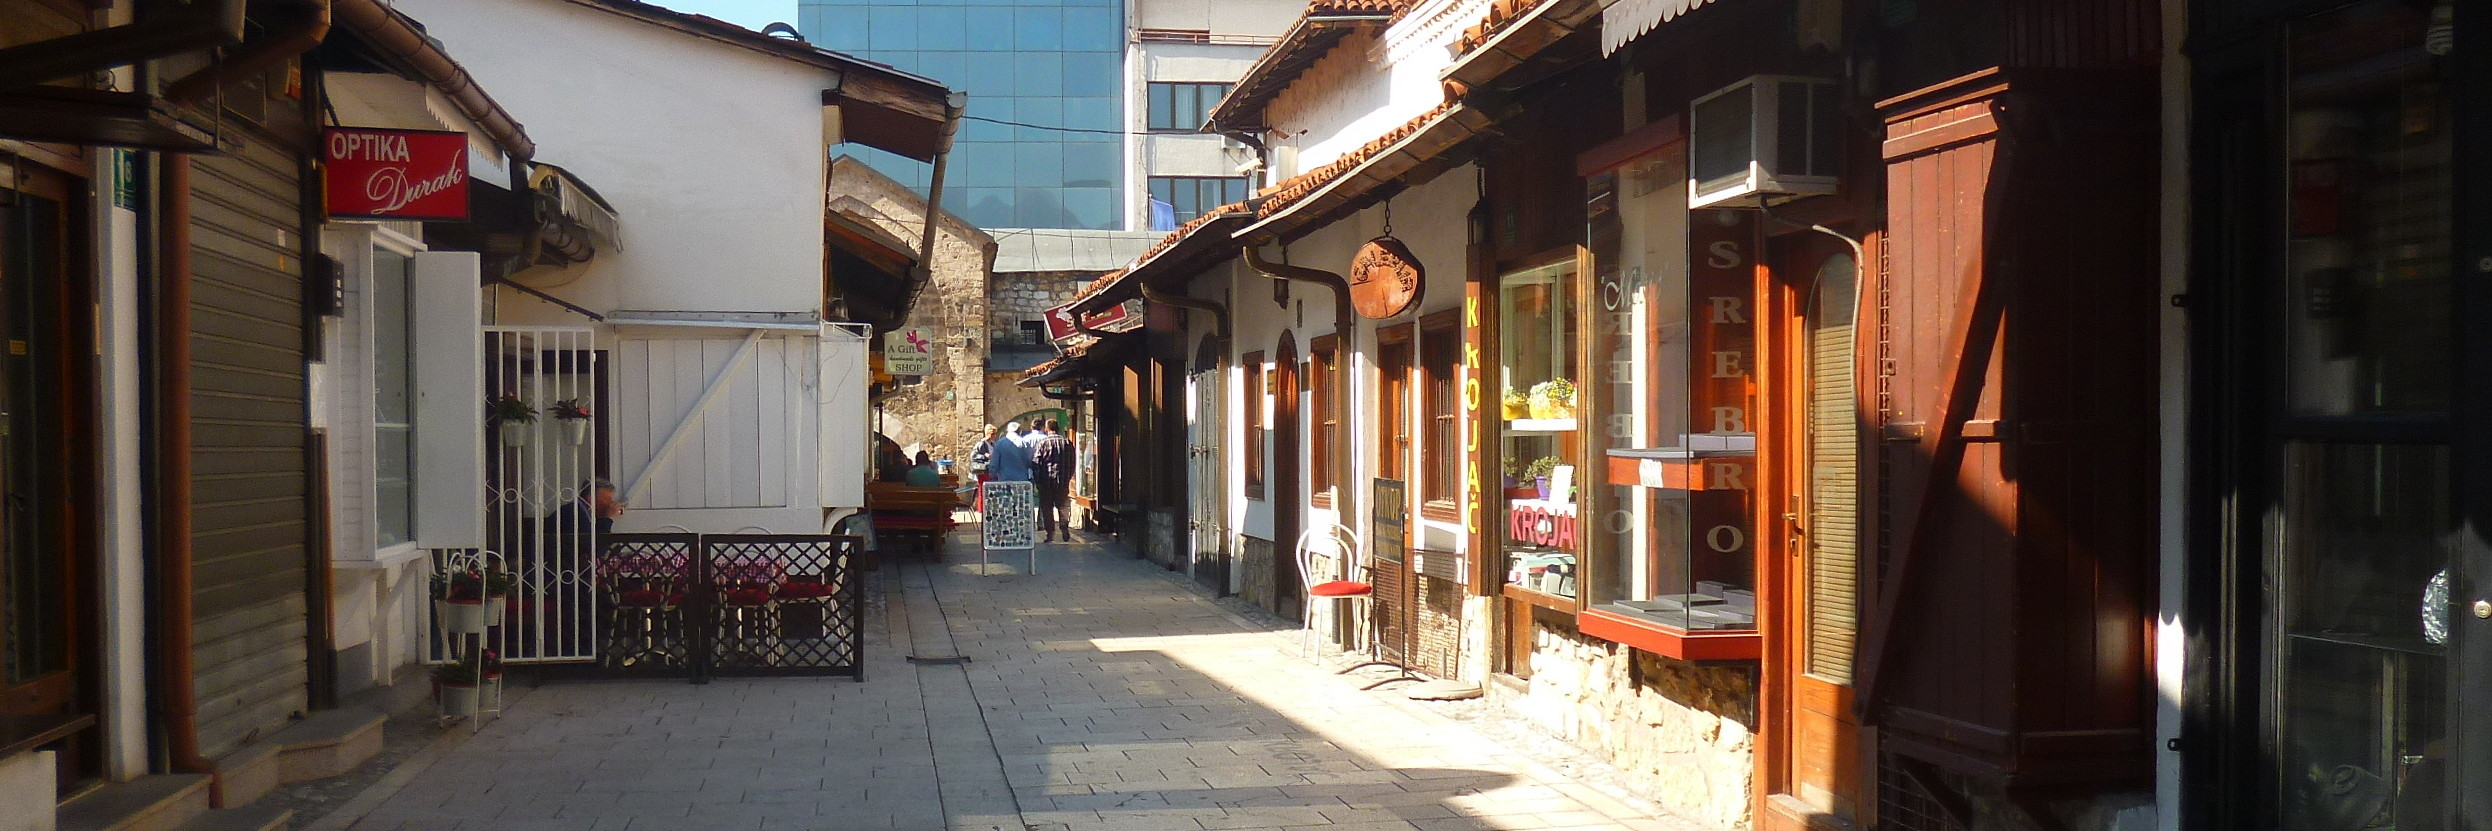 Улица Куюнджилук в Сараево